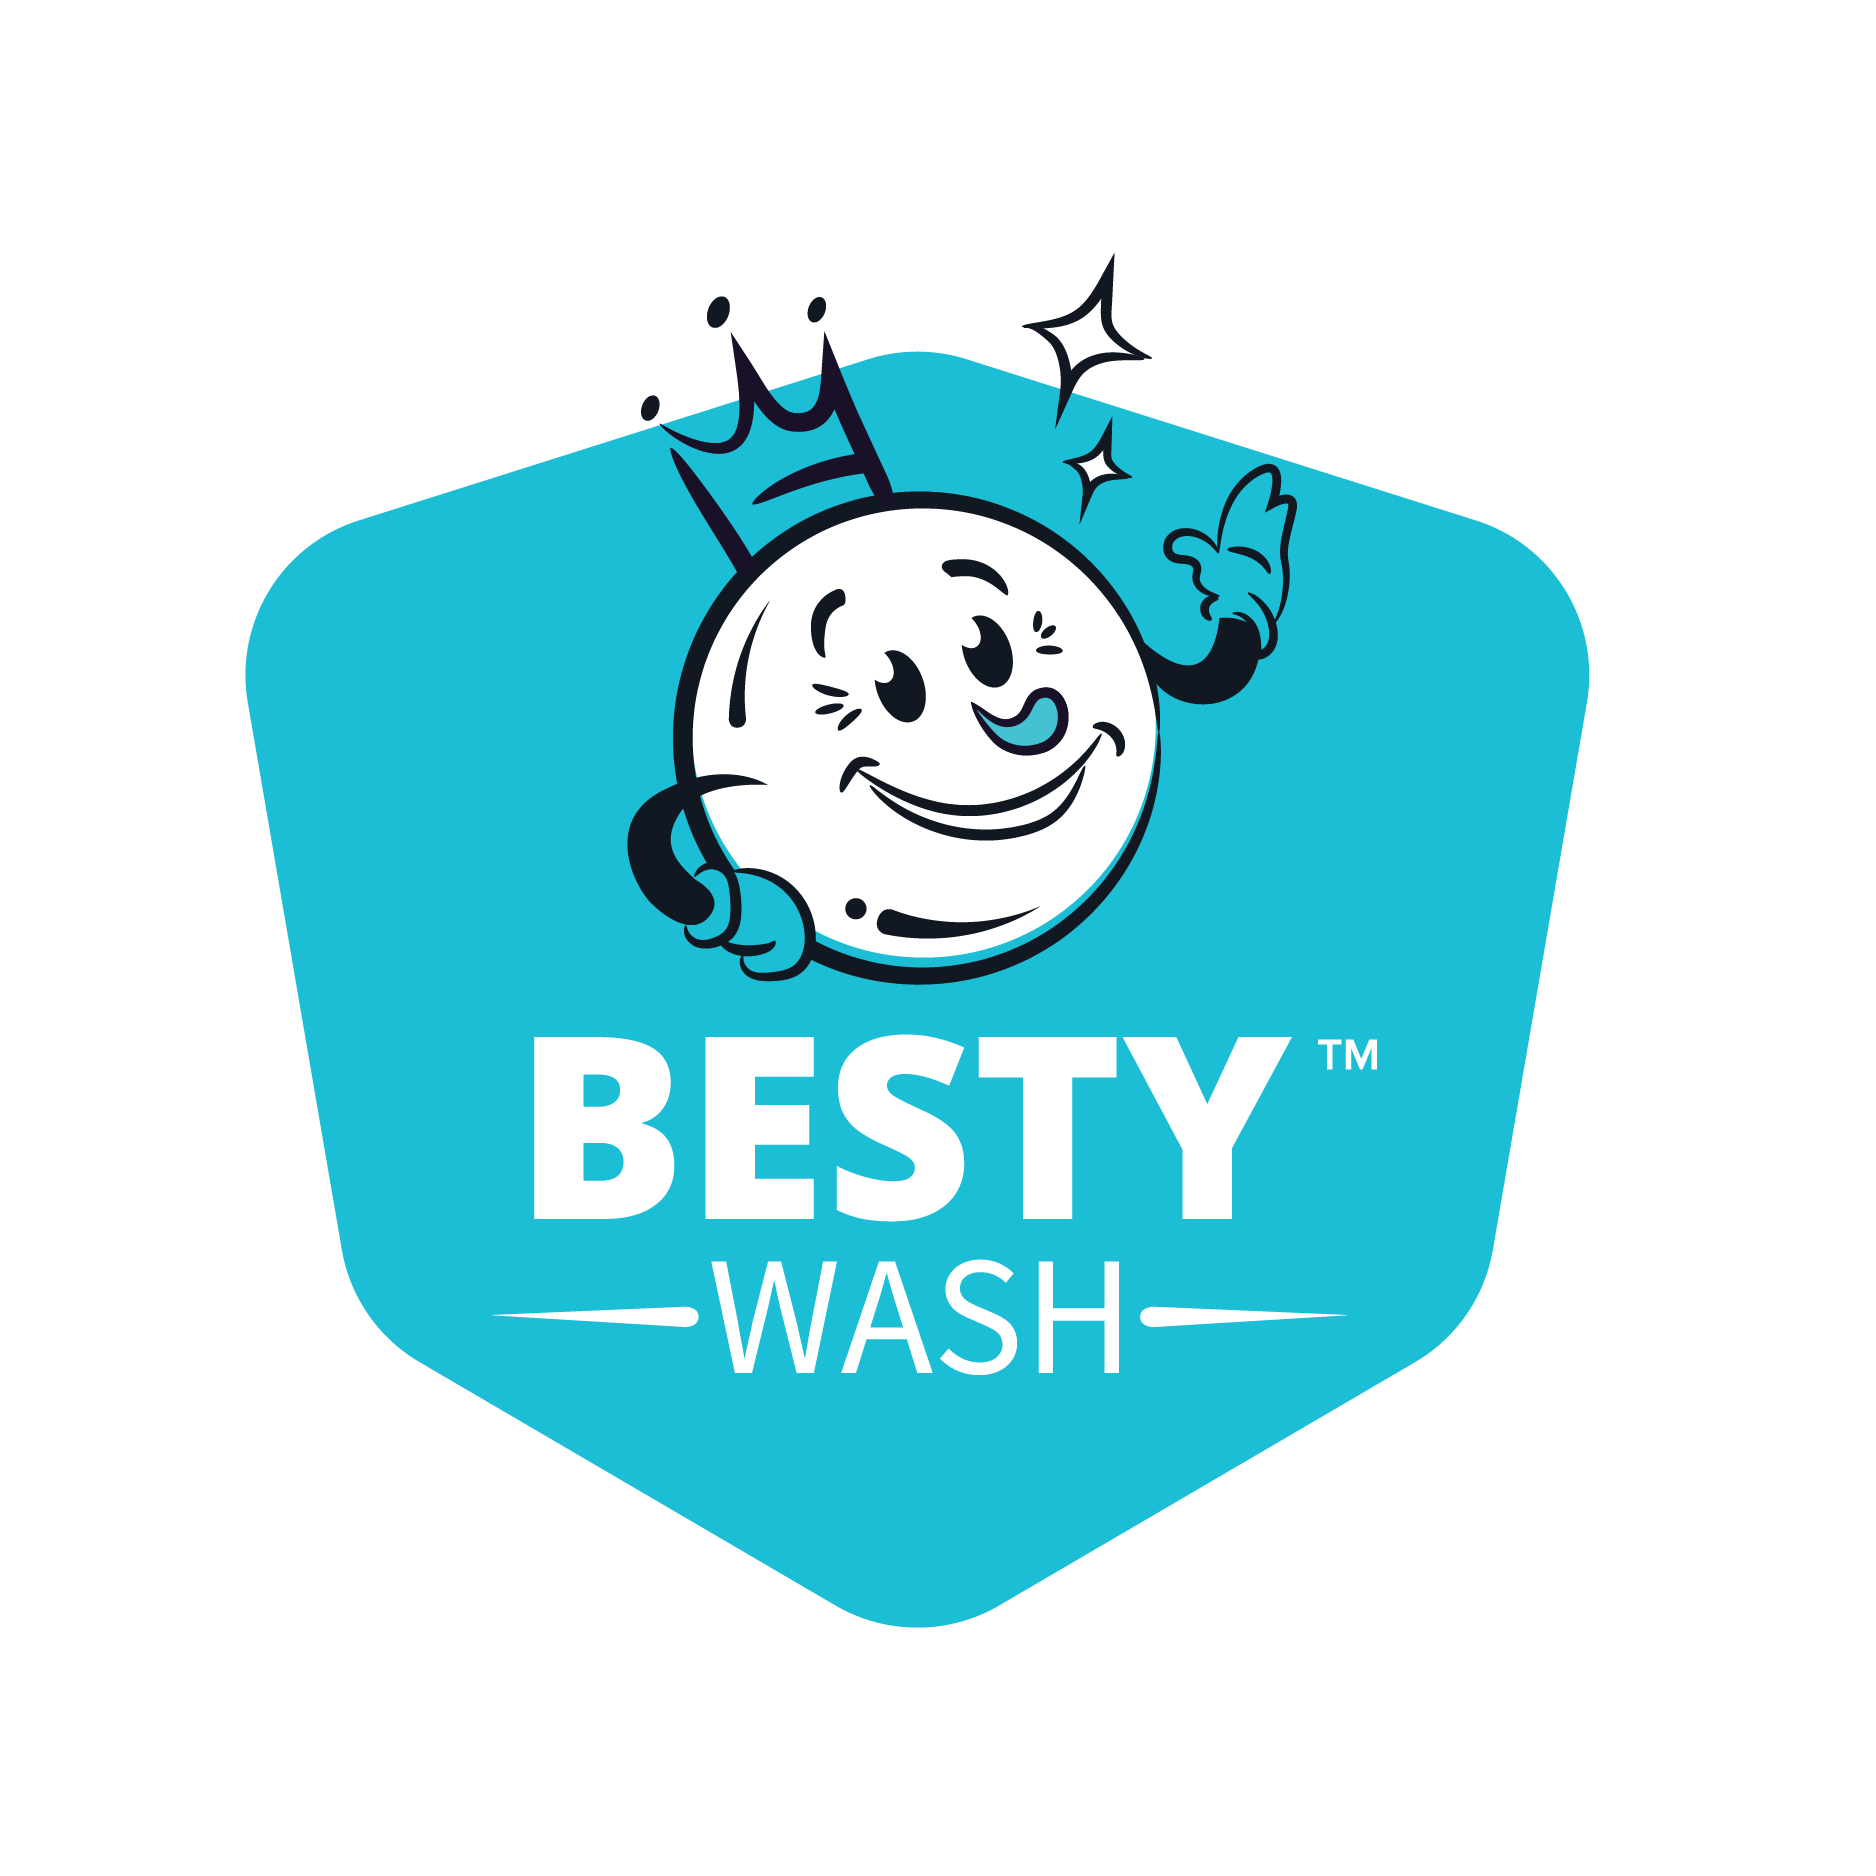 BD-wash-characters-01